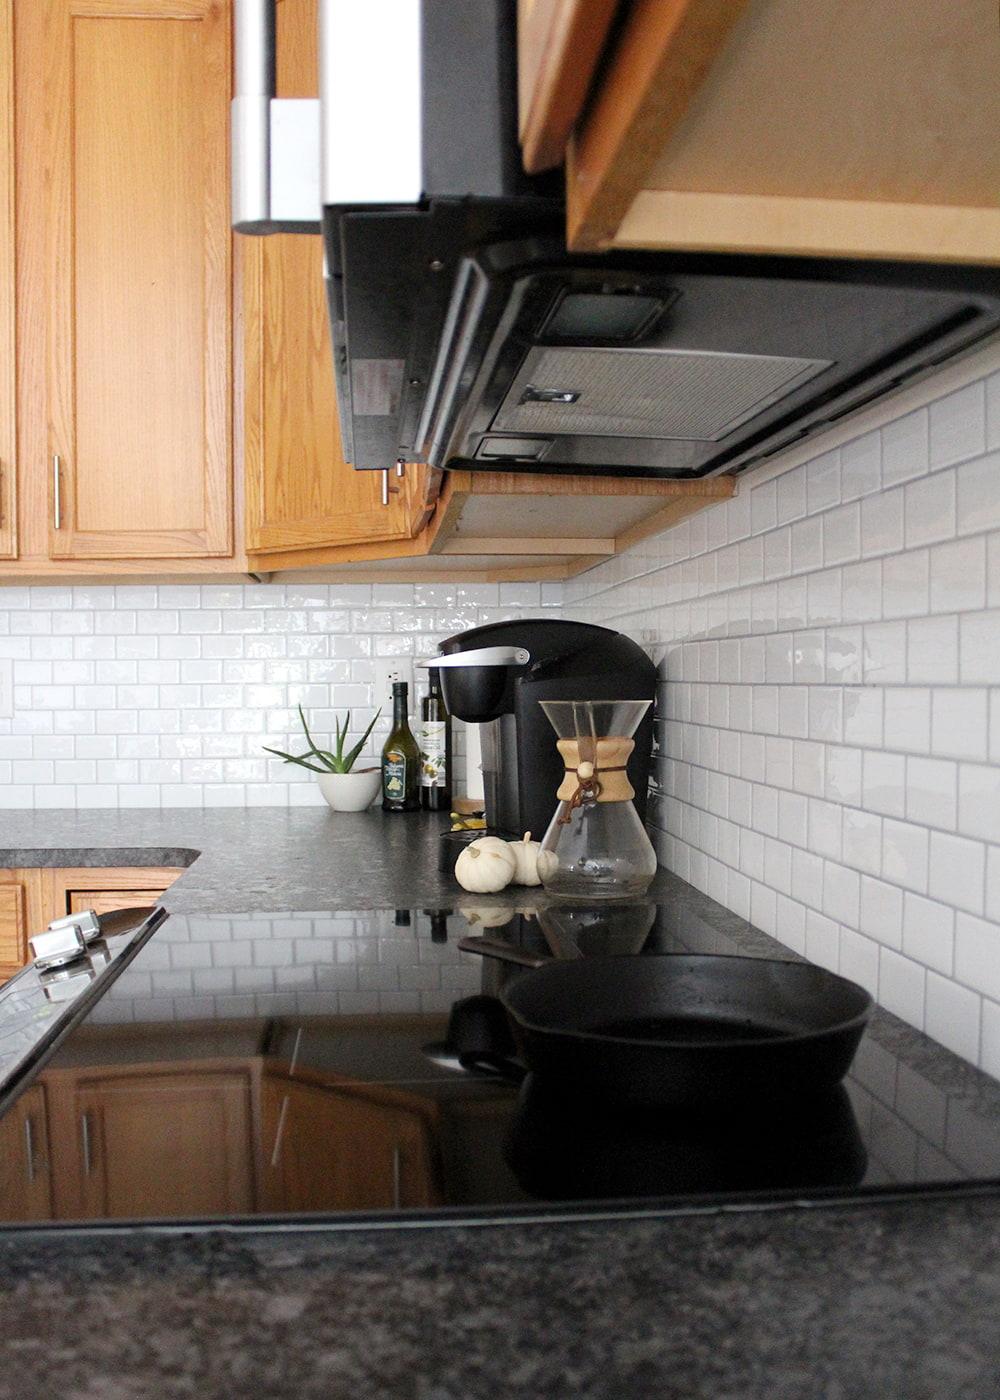 DIY peel and stick subway tile backsplash for under $125 #smallbudget #kitchenDIY #weekendproject